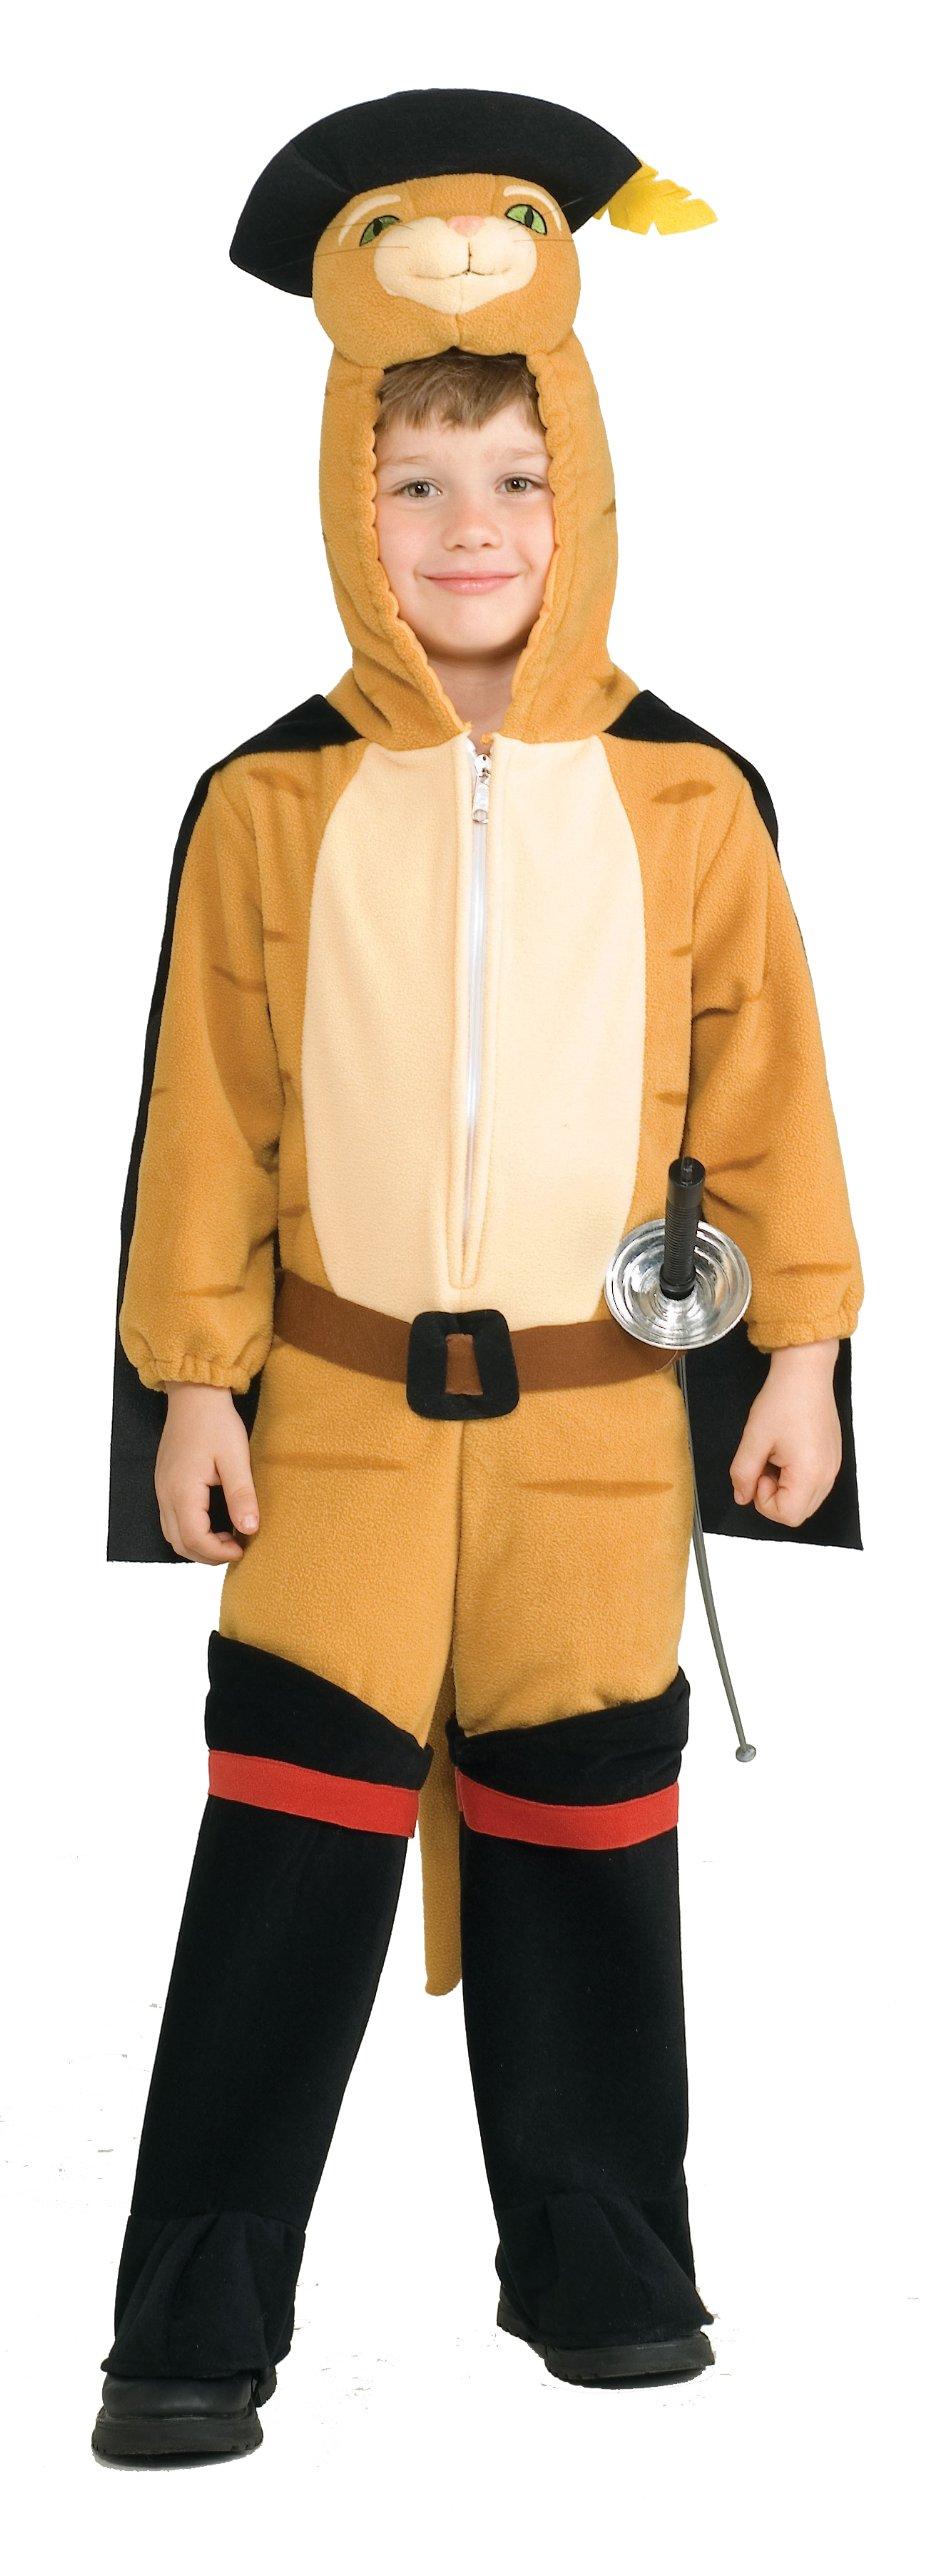 Shrek Child's Deluxe Costume, Puss 'N Boots Costume, Toddler